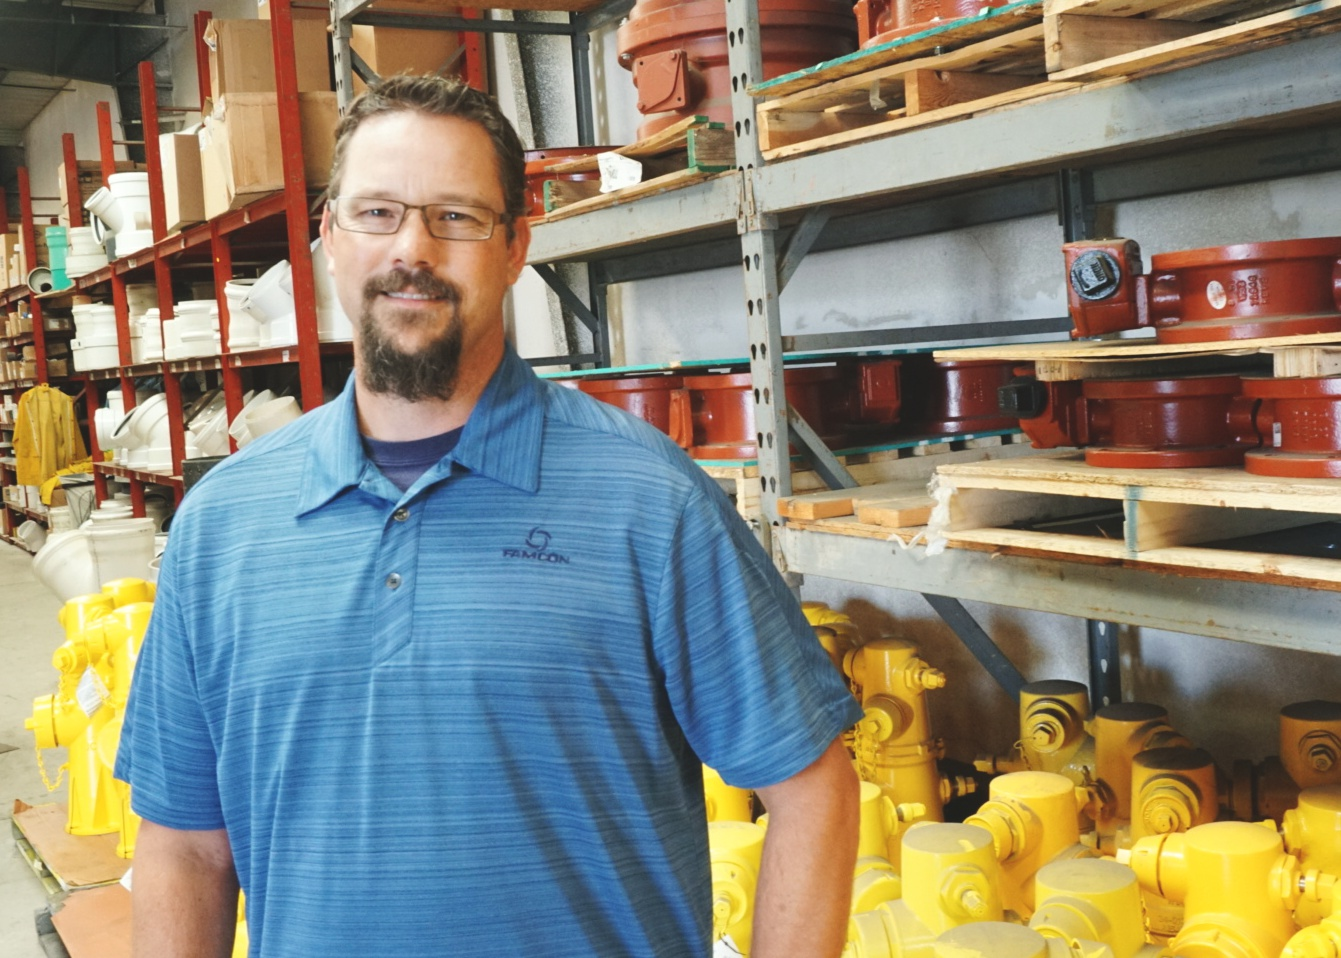 Brian HenryWater Works Sales -